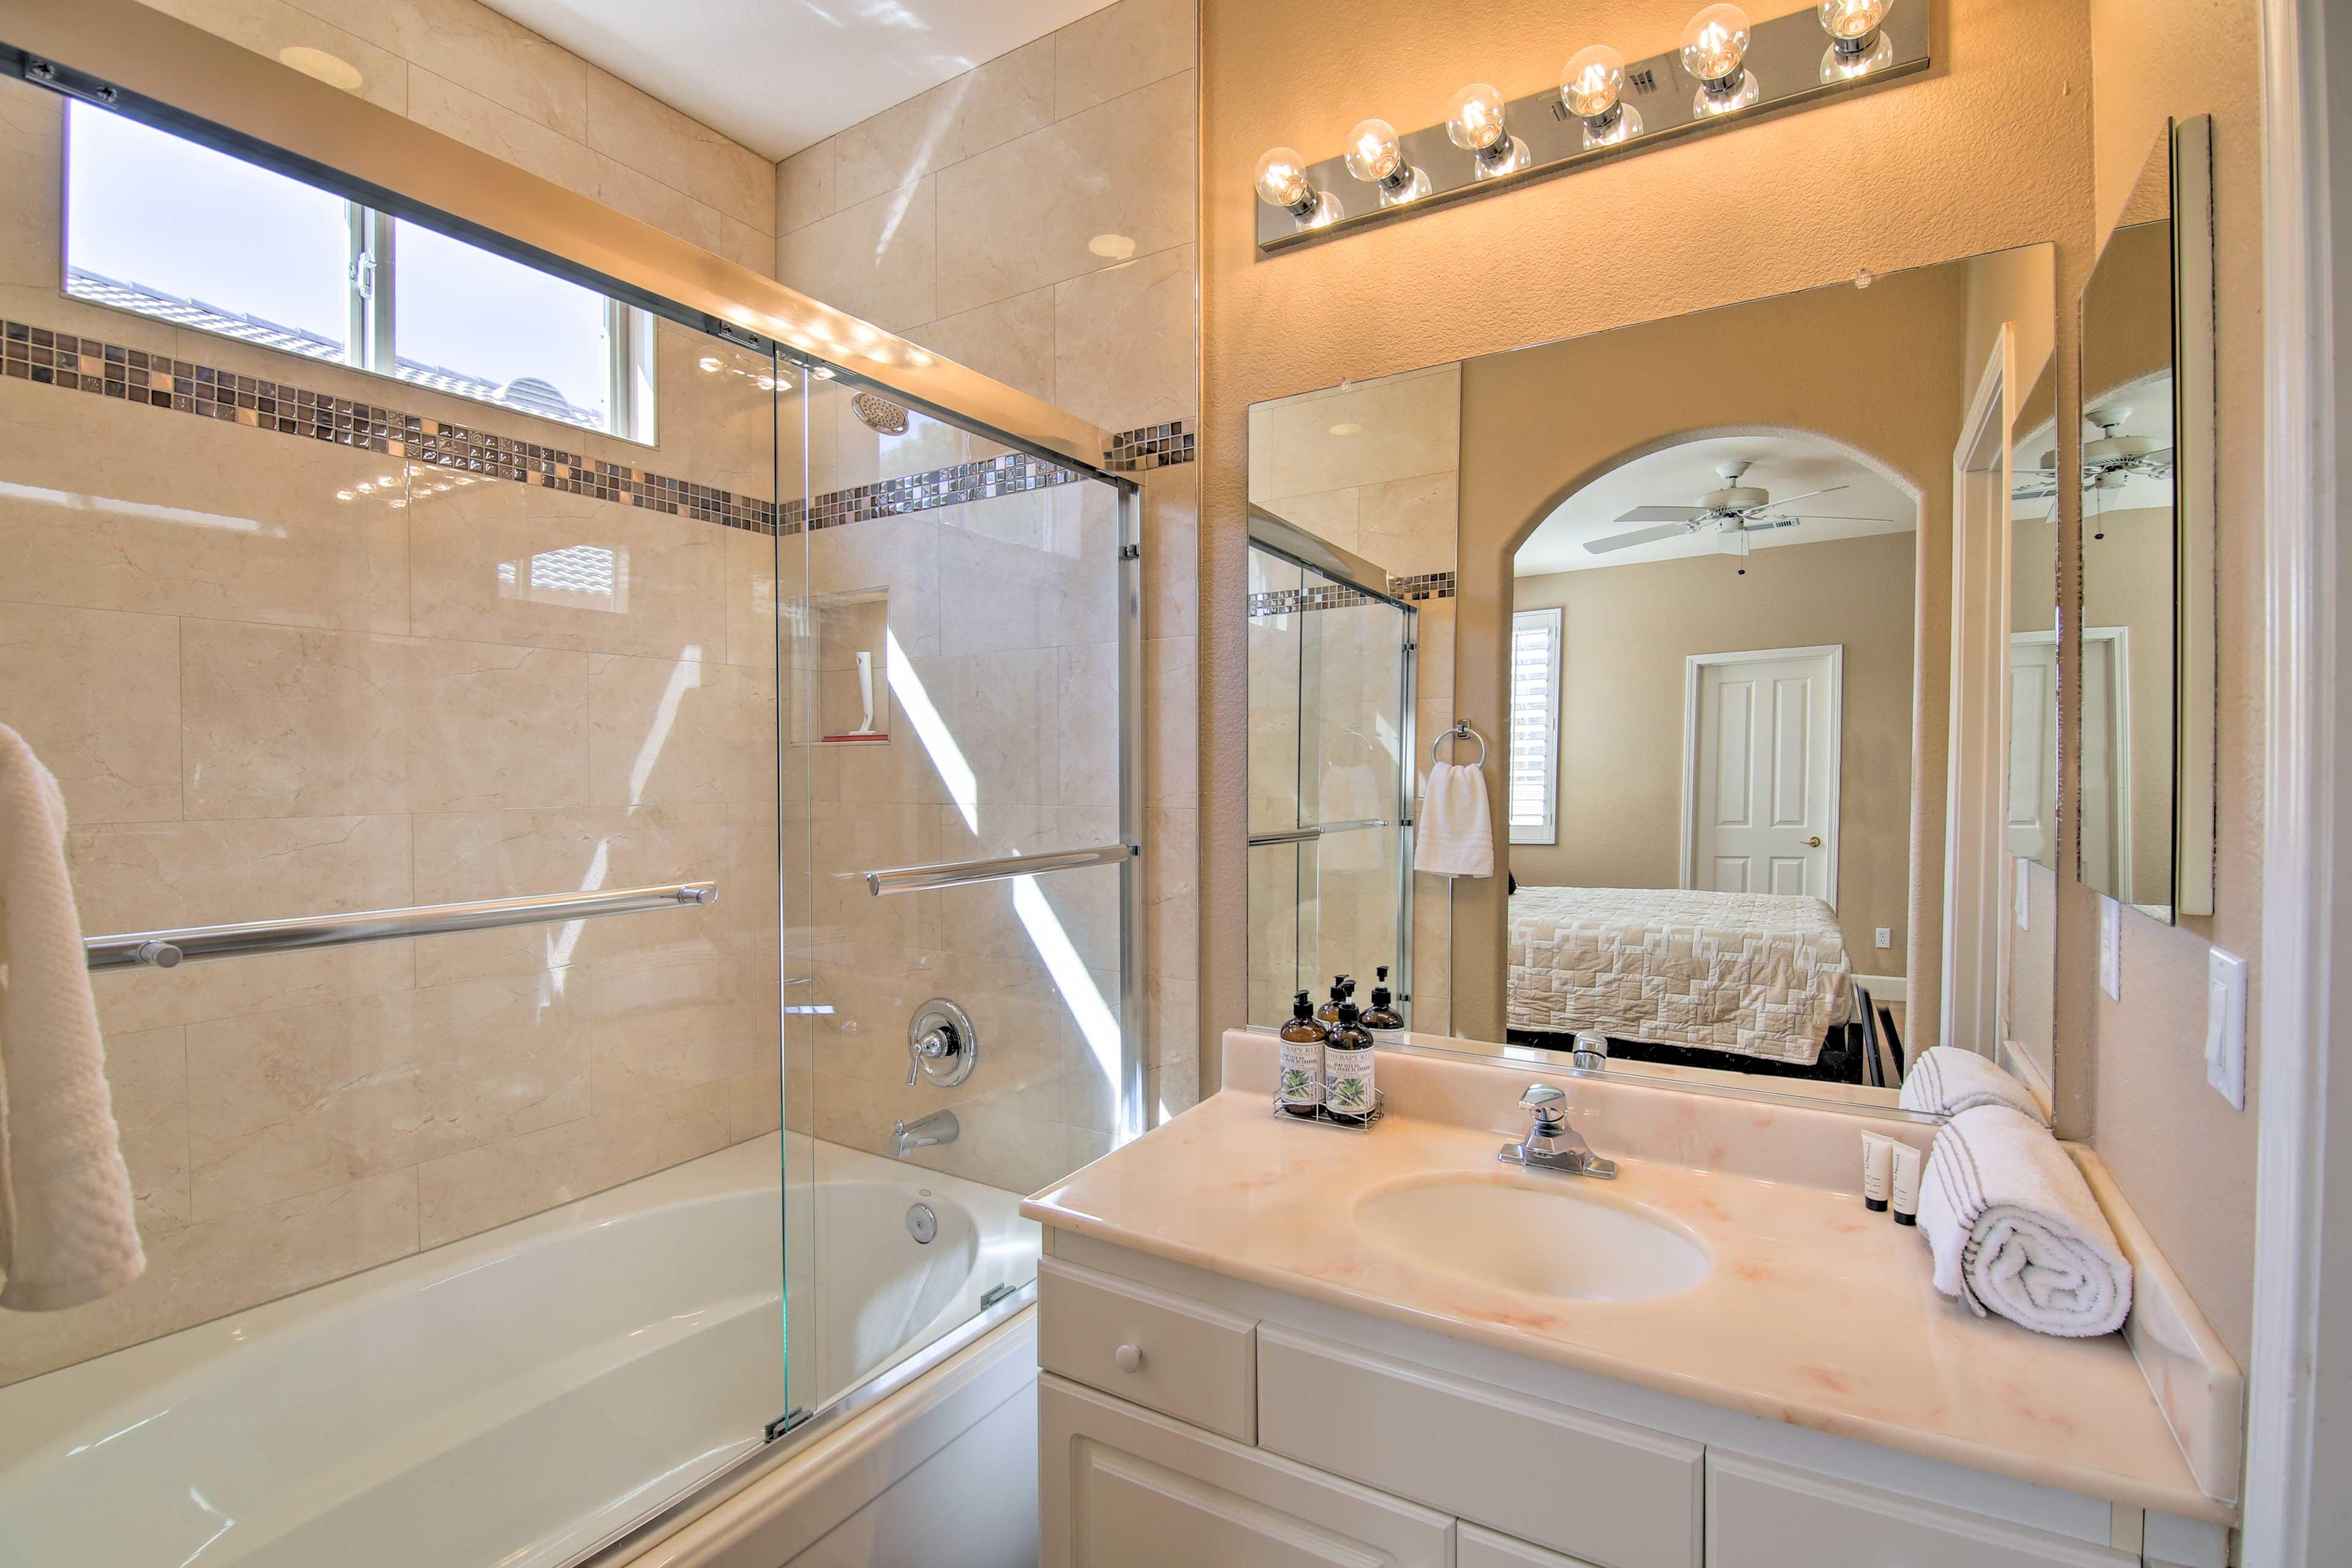 Full Bathroom   Towels Provided   Shower/Tub Combo